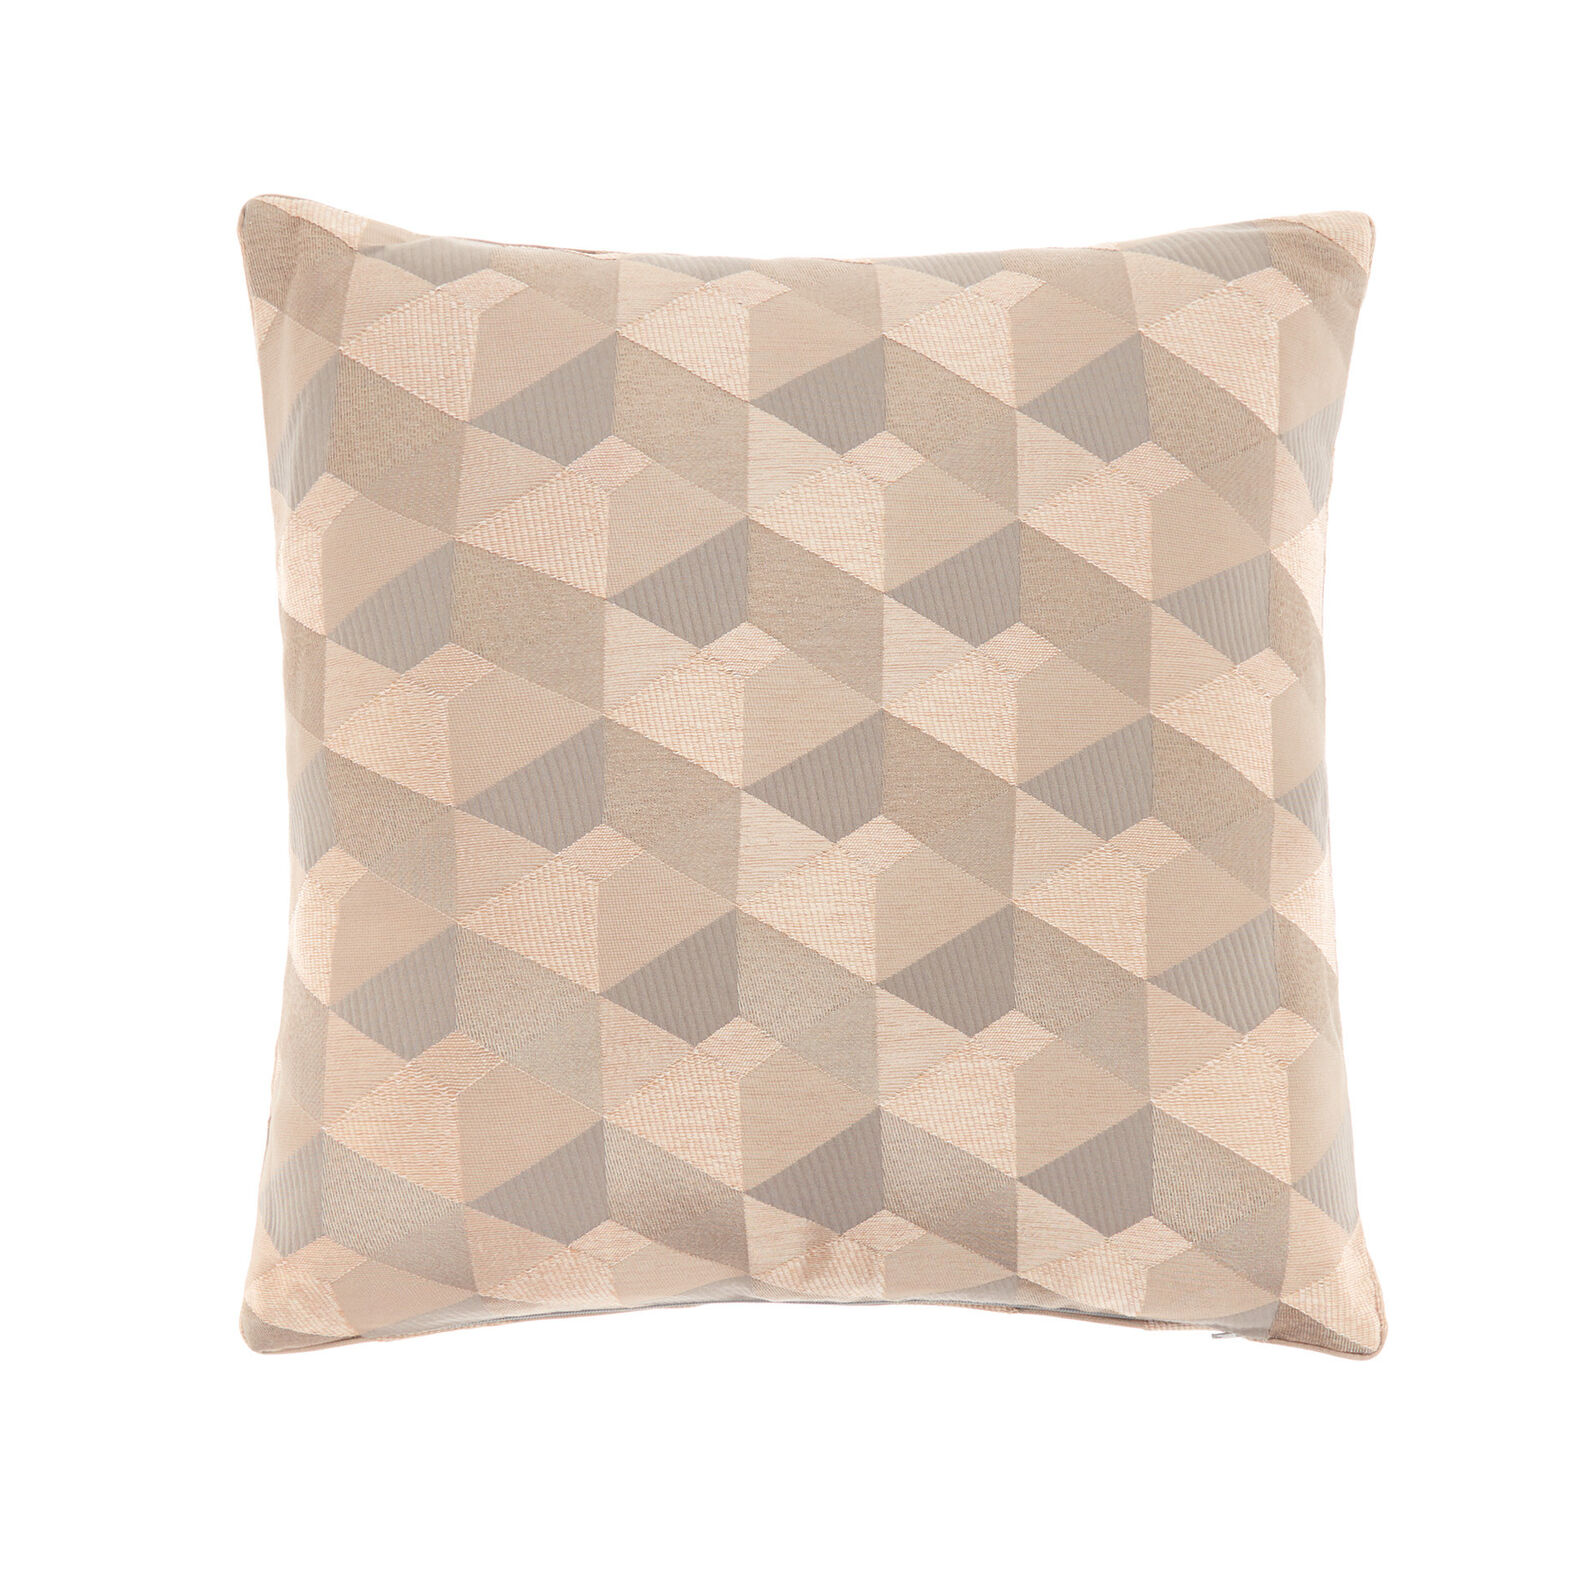 Jacquard diamond cushion 45x45cm